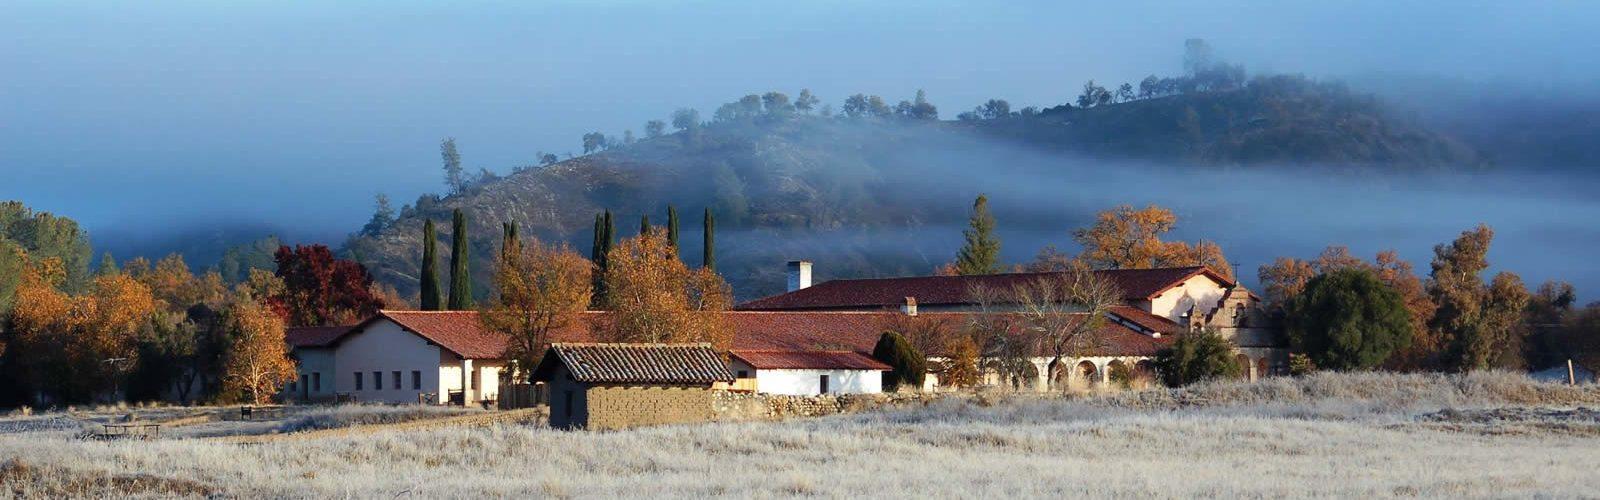 missions-religieuses-espagnoles-californie-une